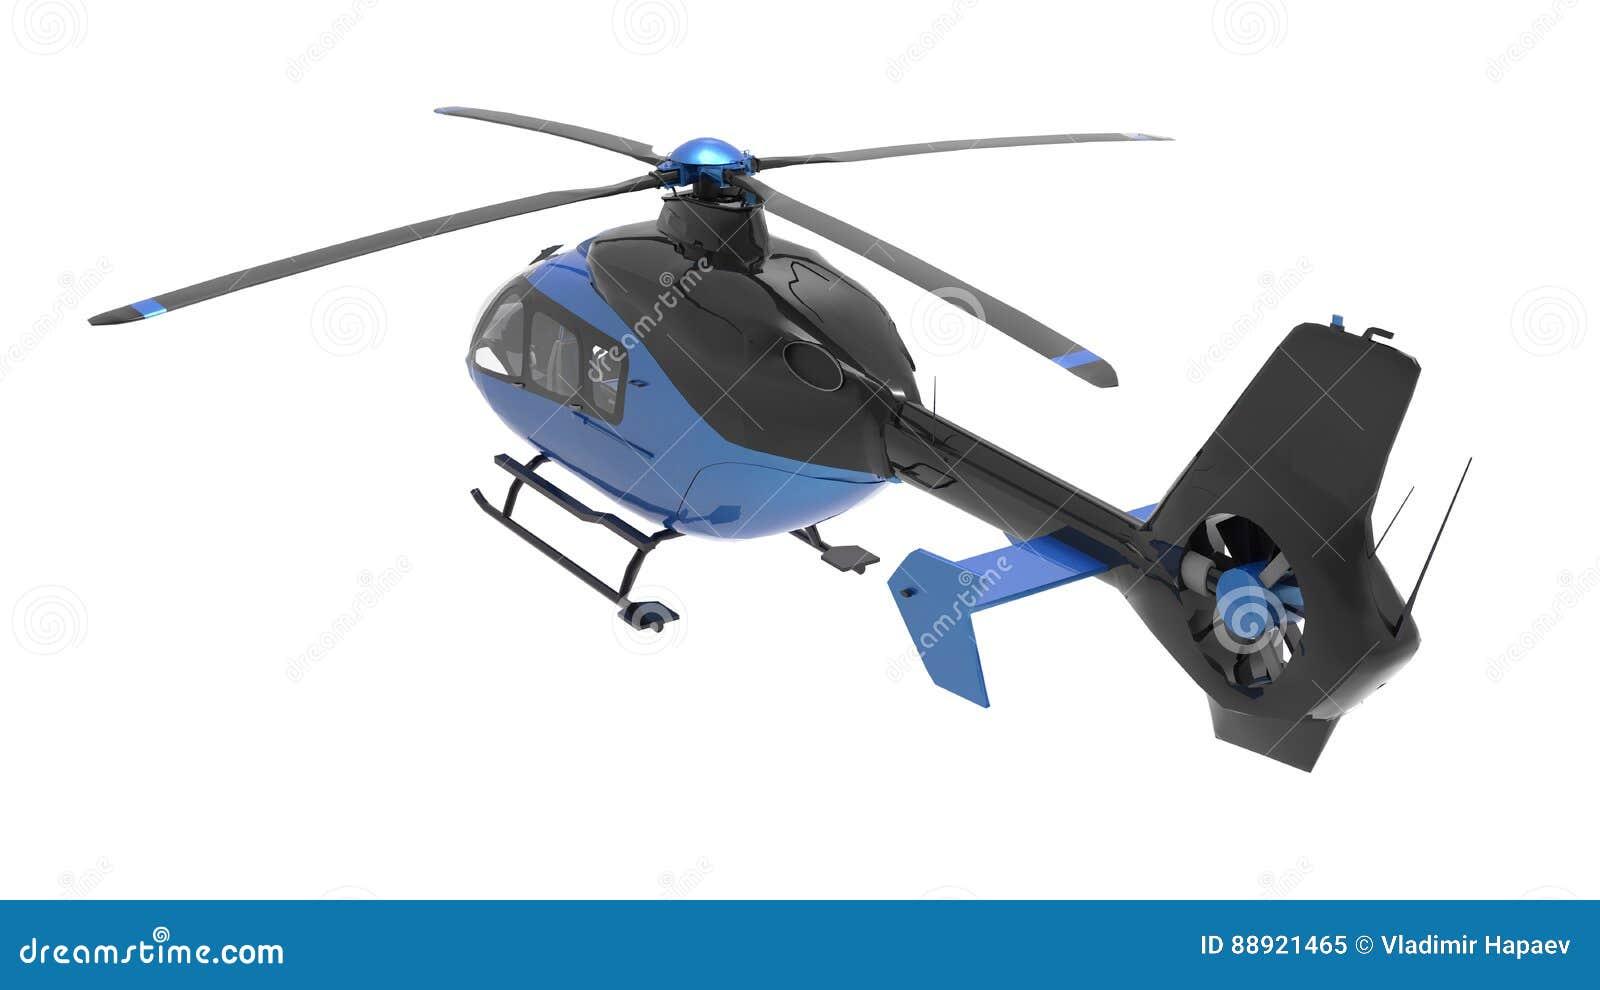 Elicottero 3d Model : Rendering d cg di un elicottero u foto stock tsuneomp